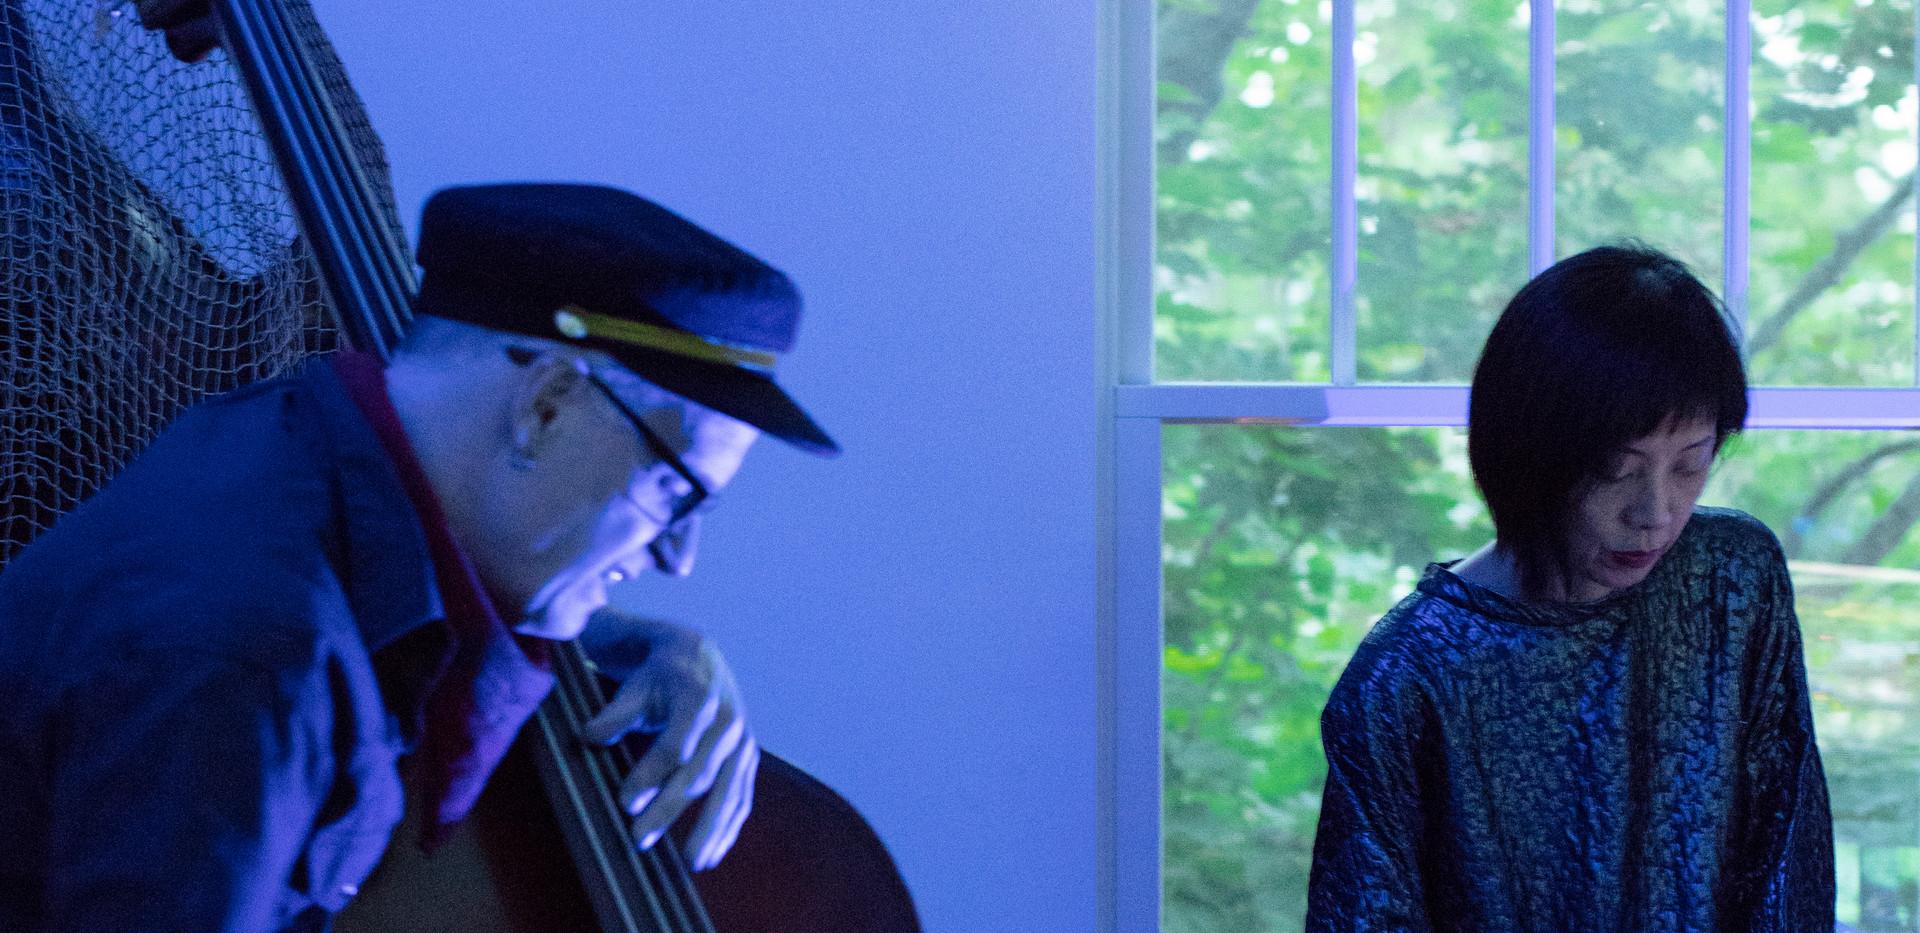 Dual live performance by multi instrumentalist Composer Yuka Honda & Cellist Devin Hoff